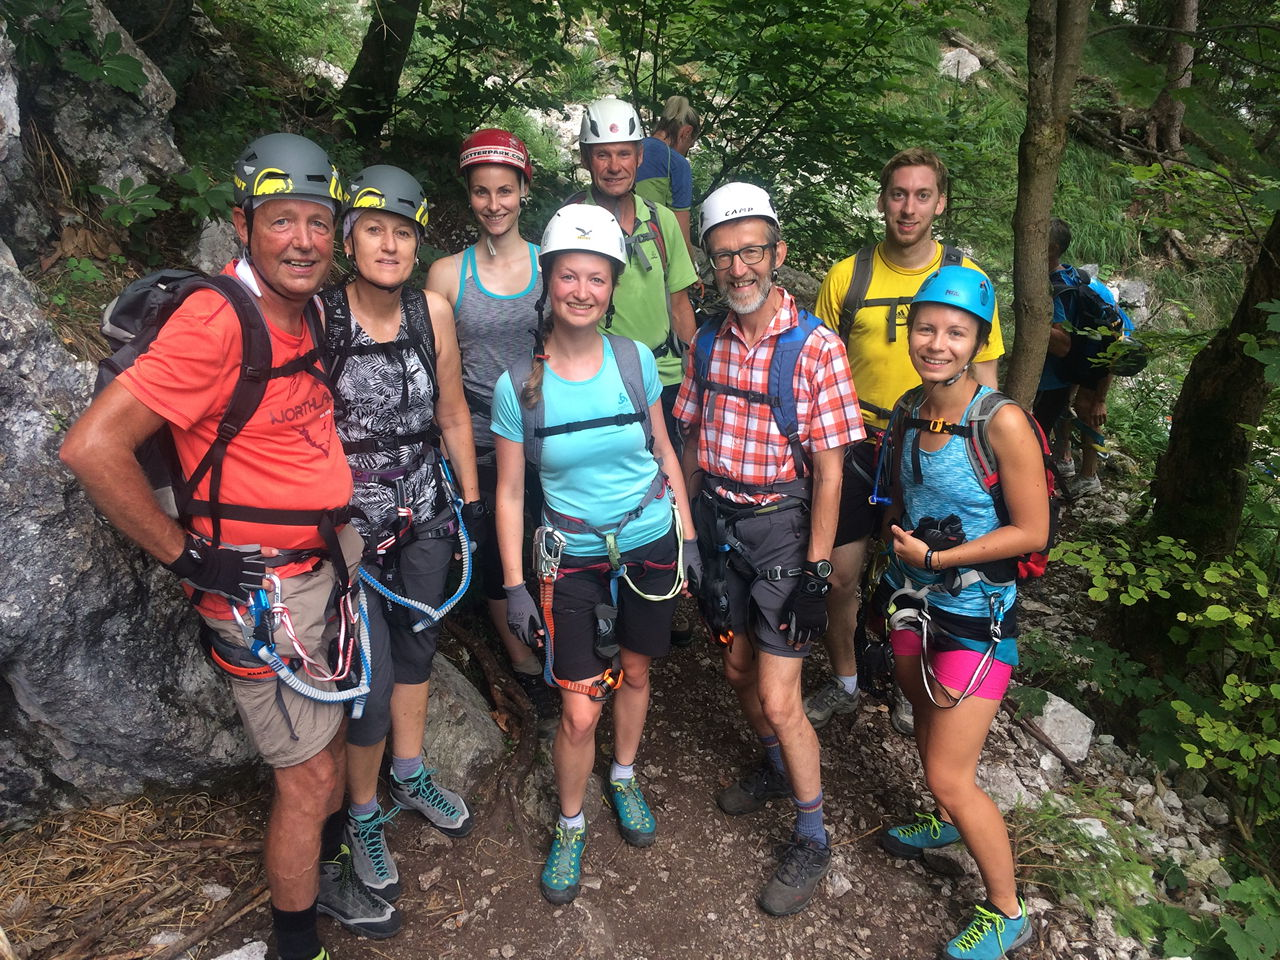 Klettersteig Mahdlgupf : Klettersteig mahdlgupf attersee feichtingerhof youtube